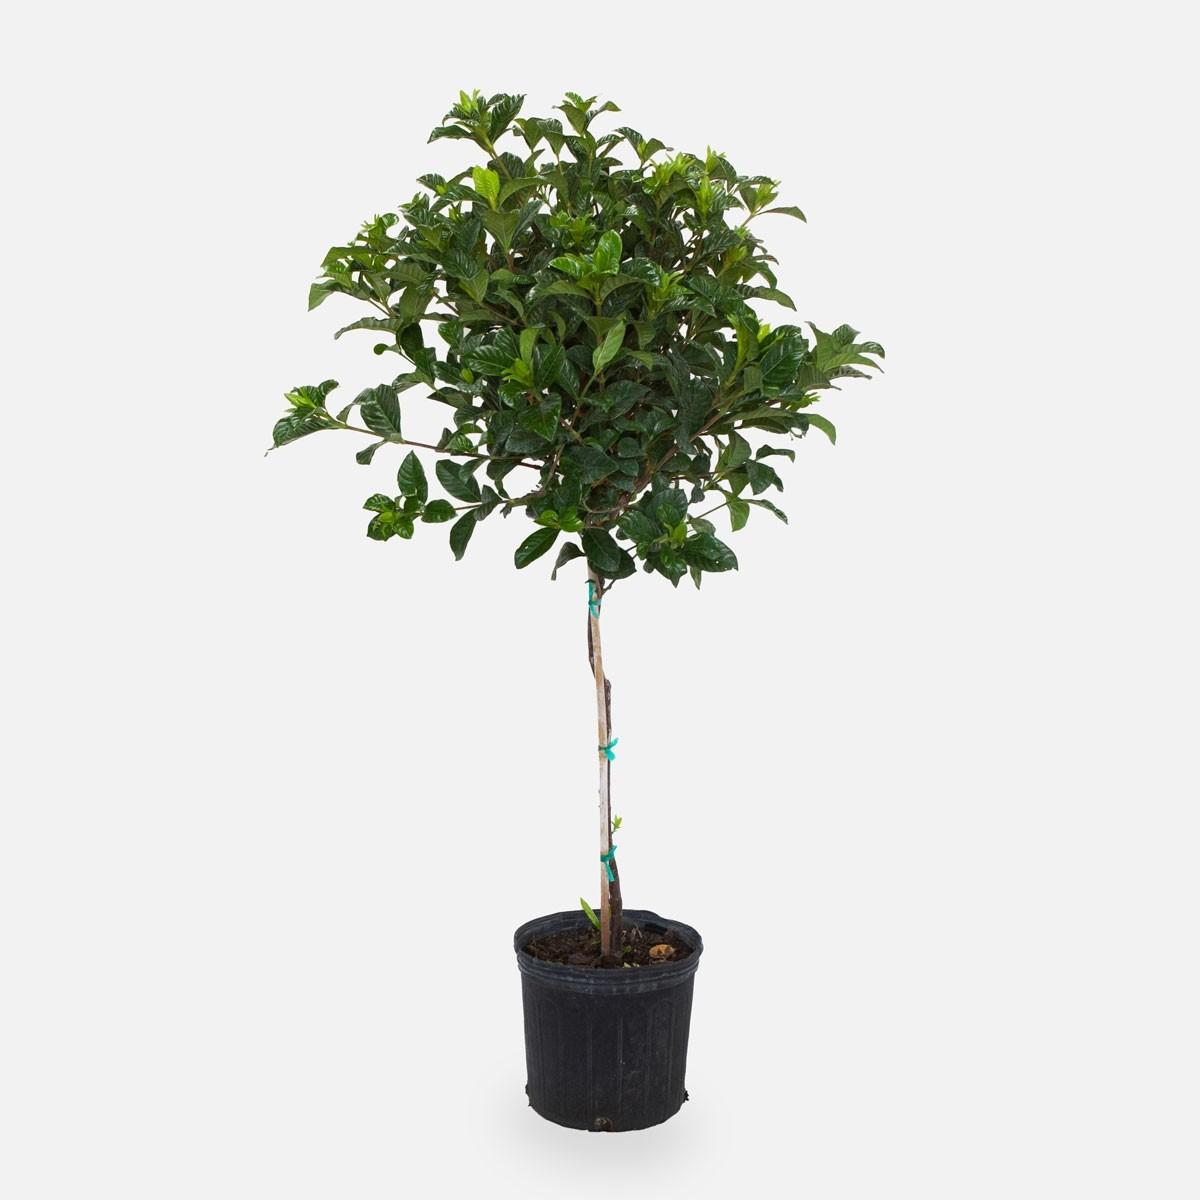 Gardenia Aimee Topiary 10 Plant Delivery Nyc Plantshed Com